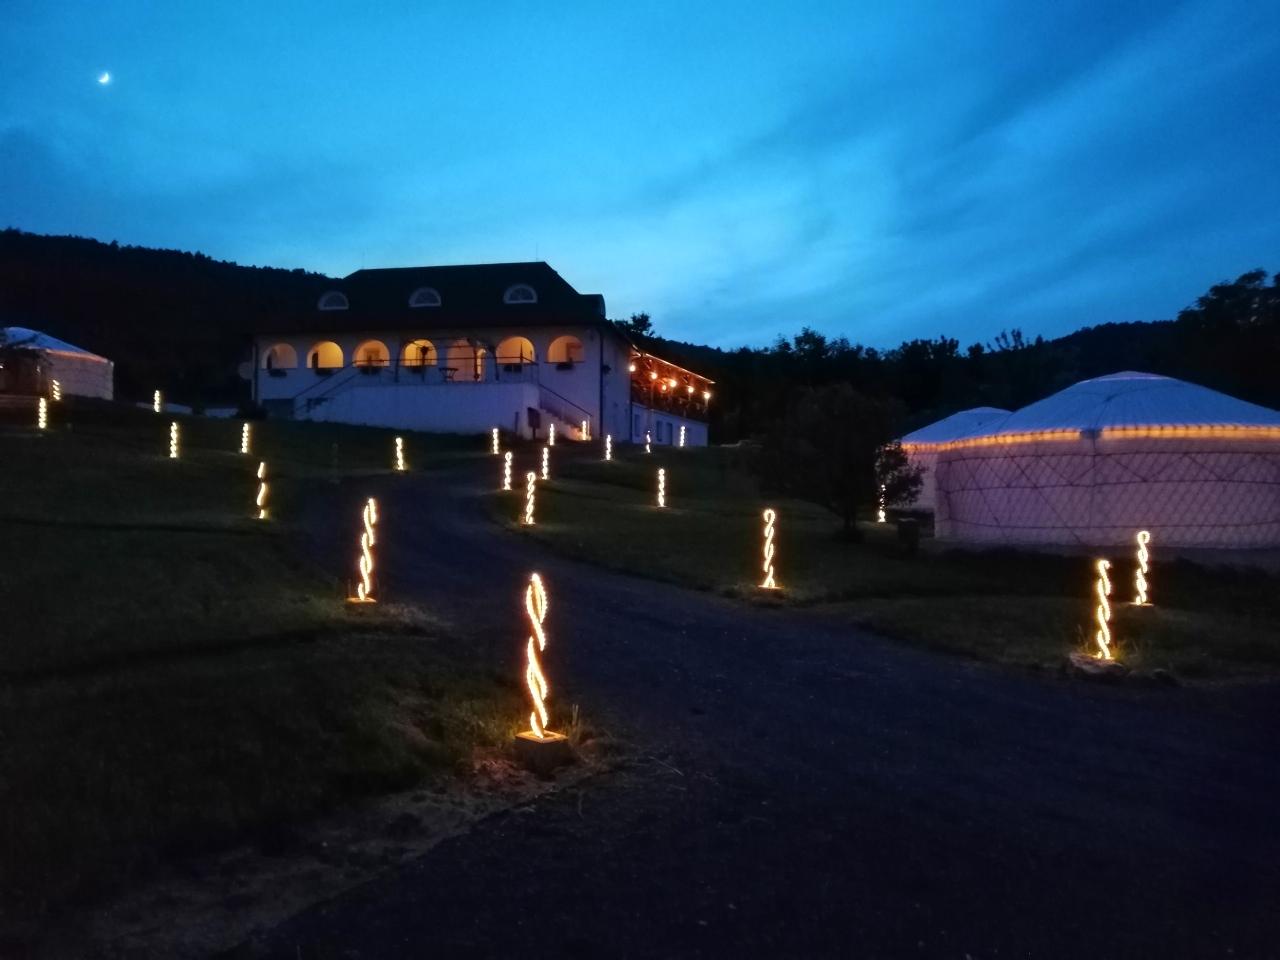 Jurta hotel Balatongyörök Galéria Park 7